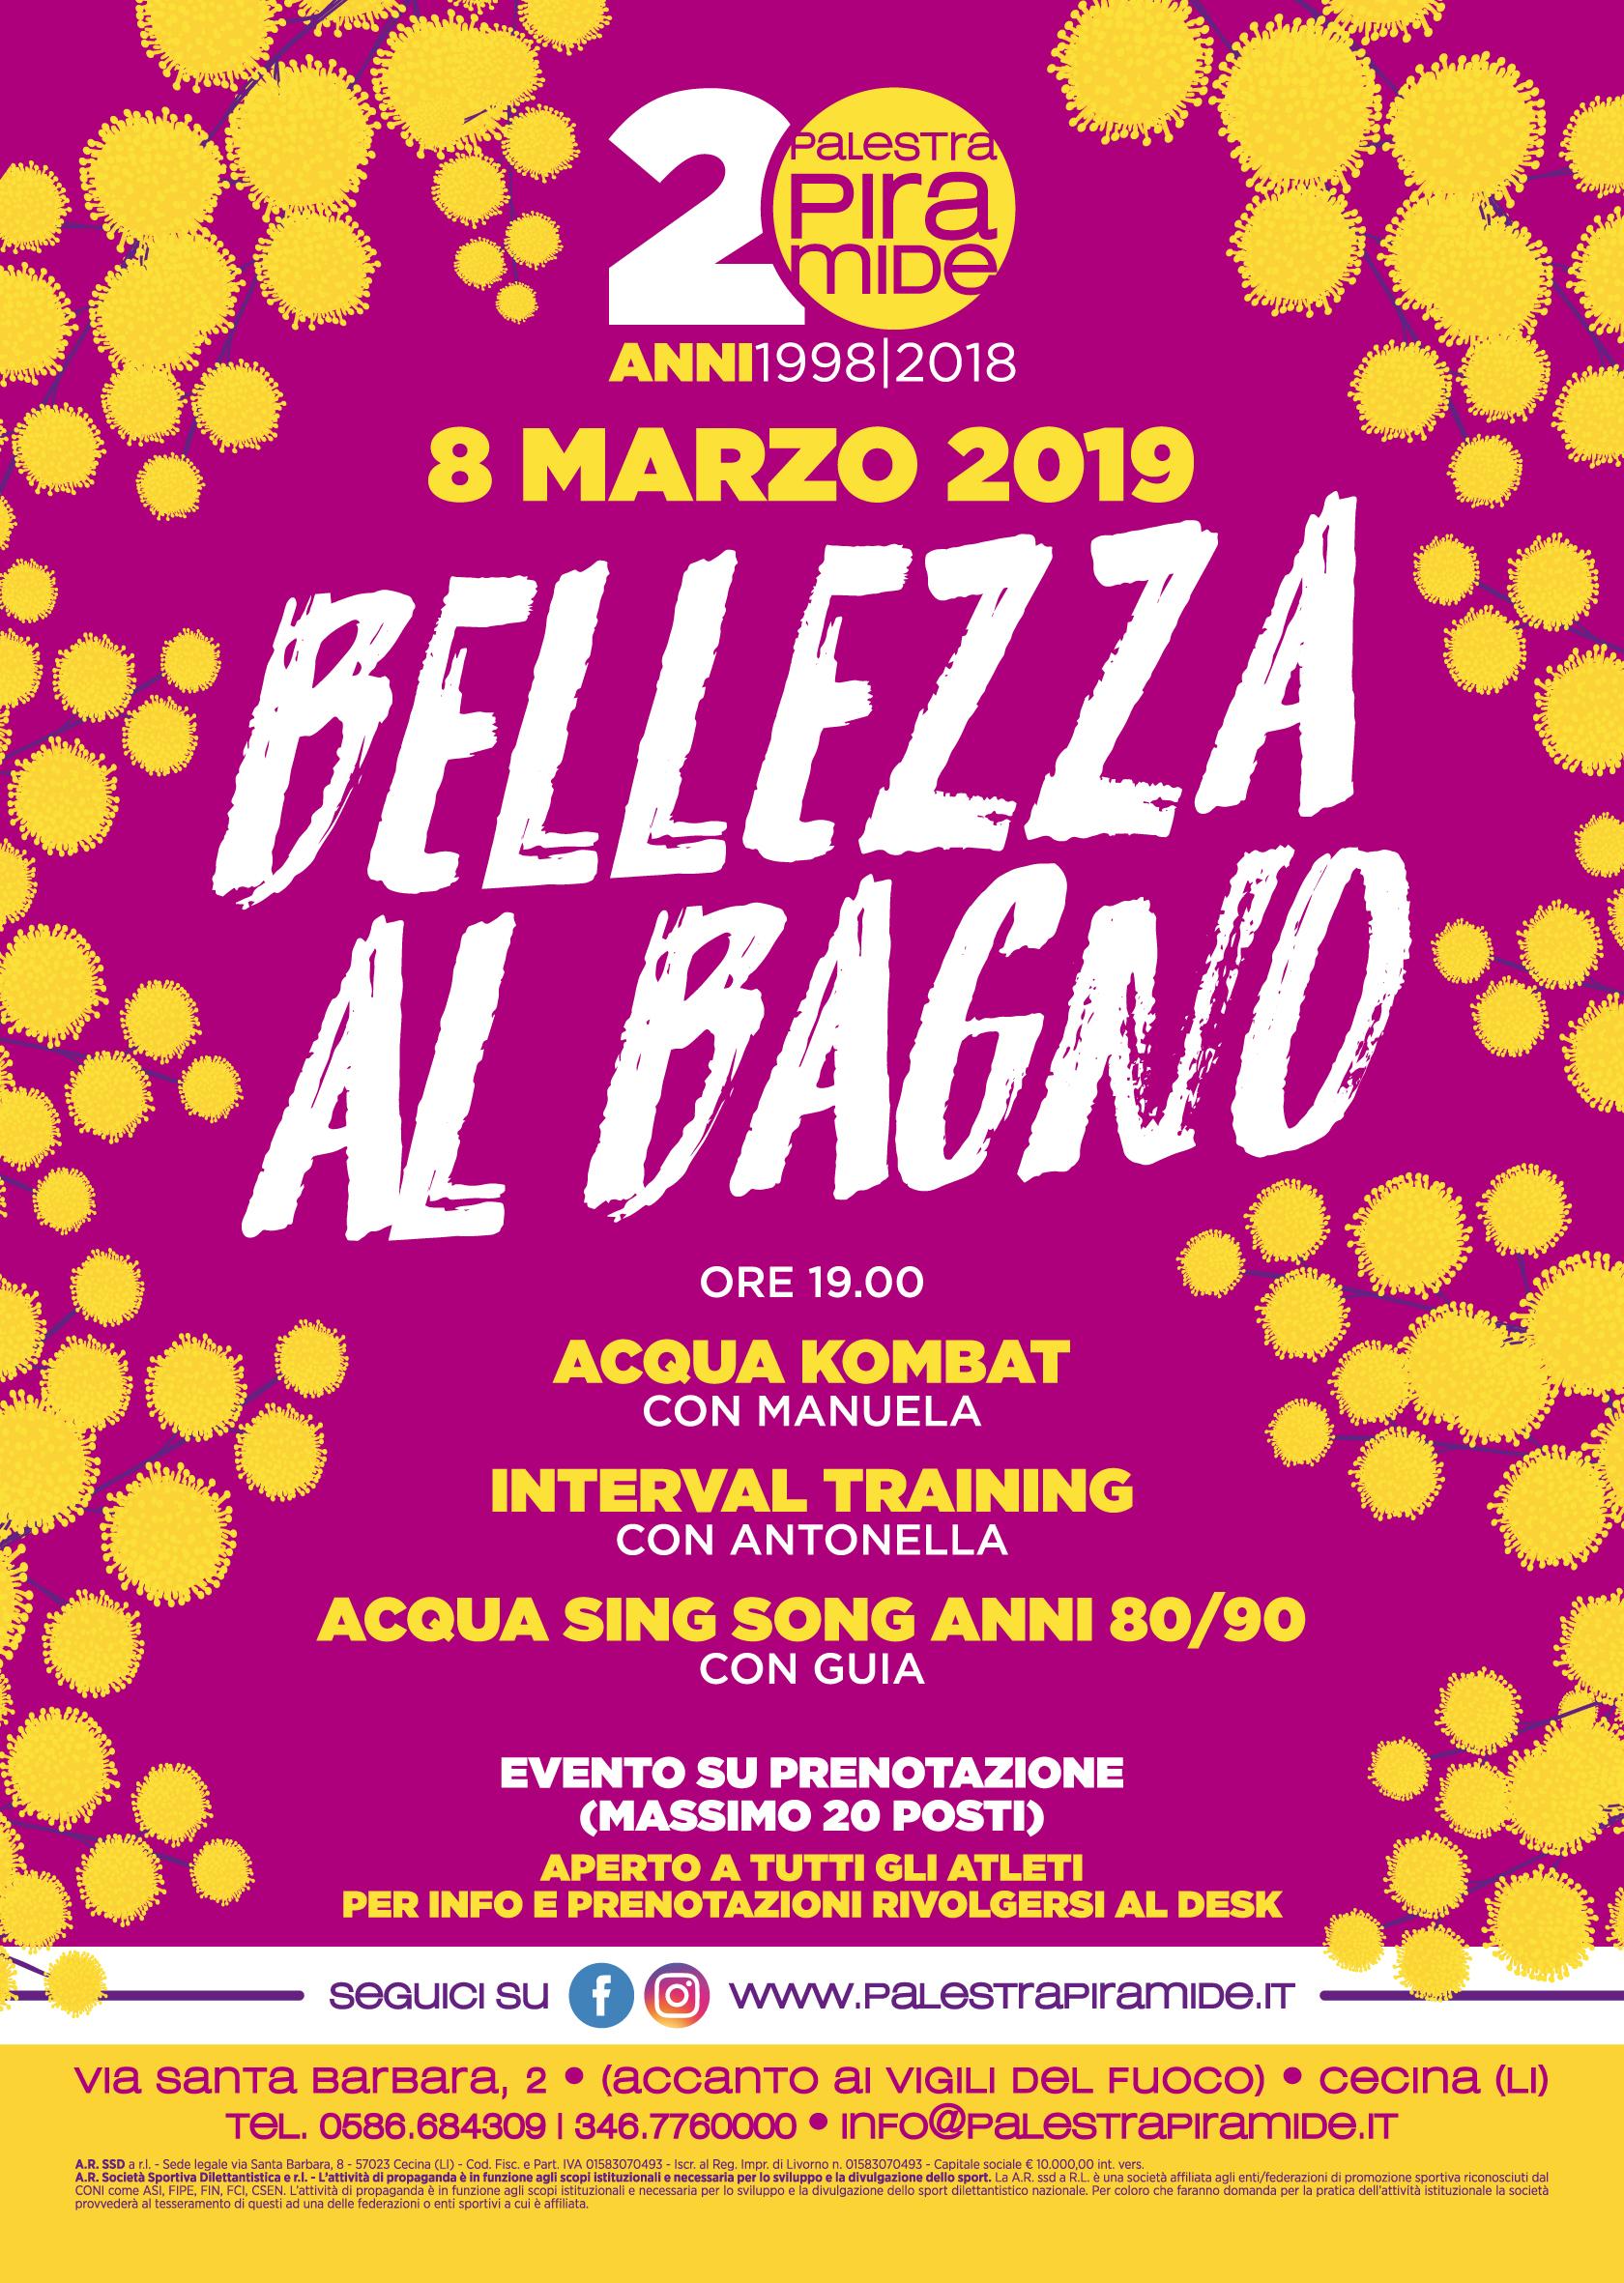 JPG Bellezza al Bagno 8 Marzo 2019 Palestra Piramide